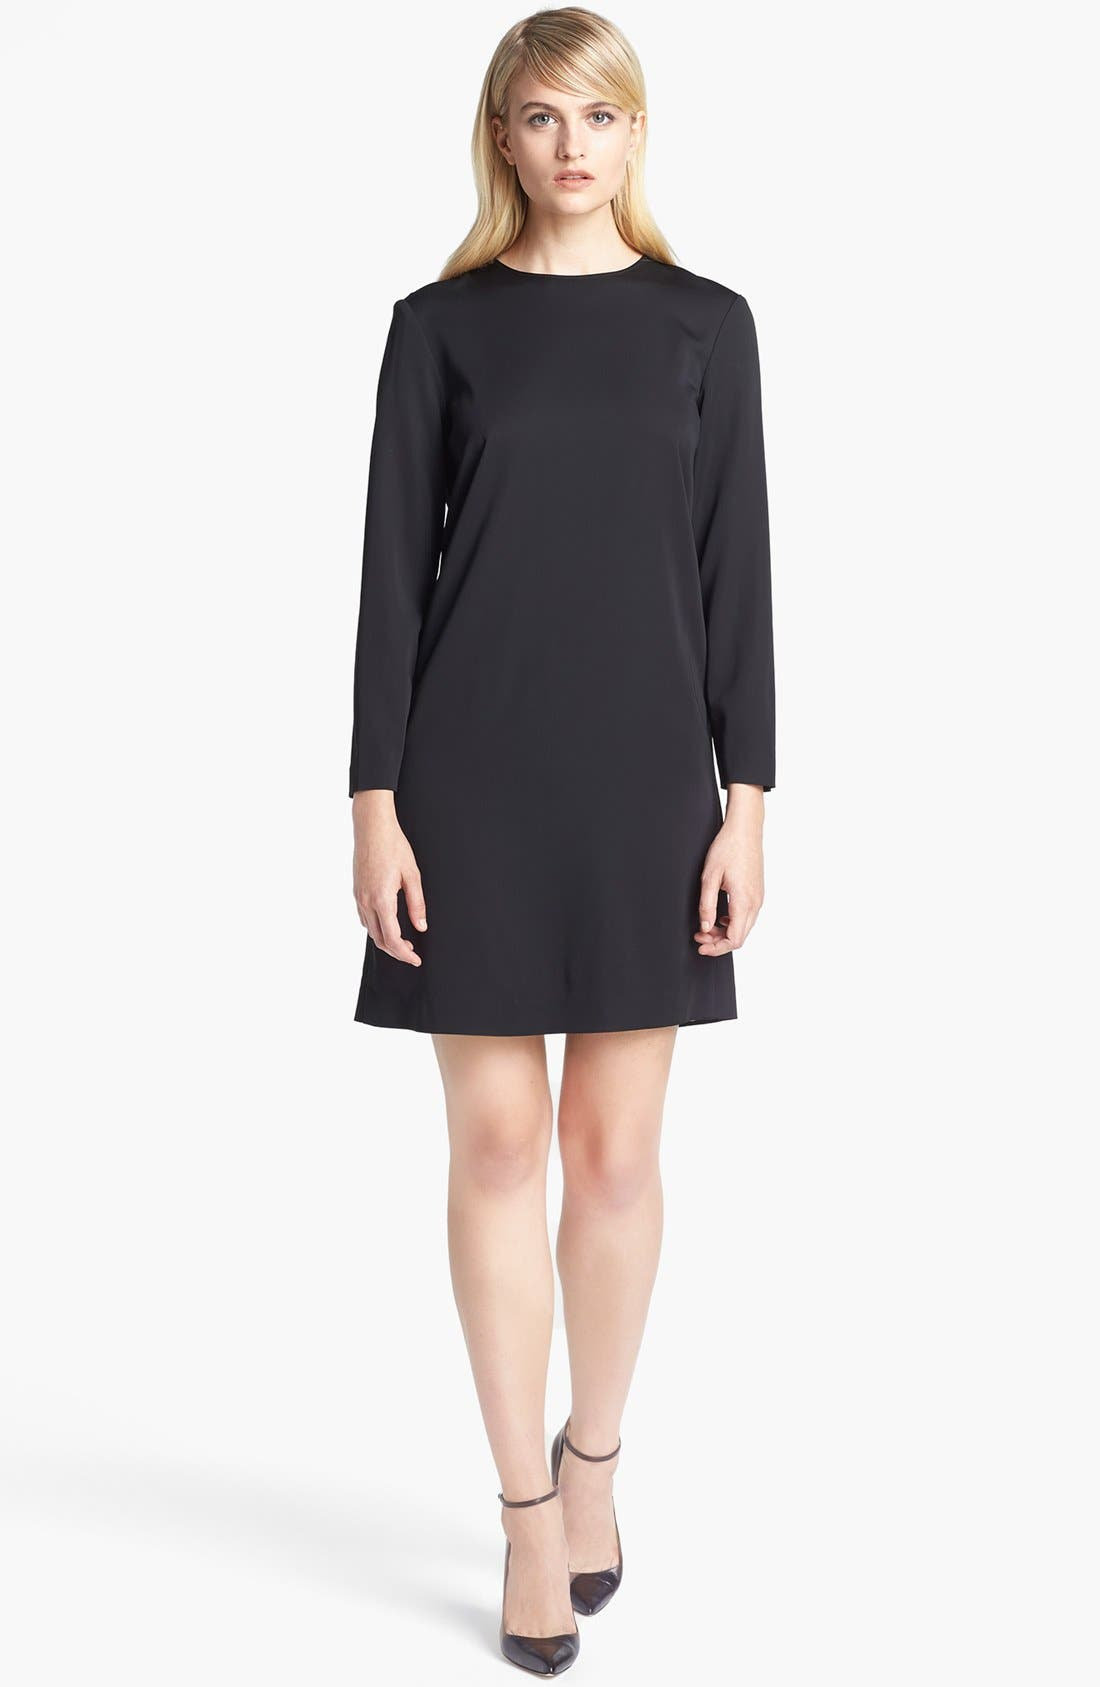 Alternate Image 1 Selected - Theory 'Landain' Stretch Shift Dress